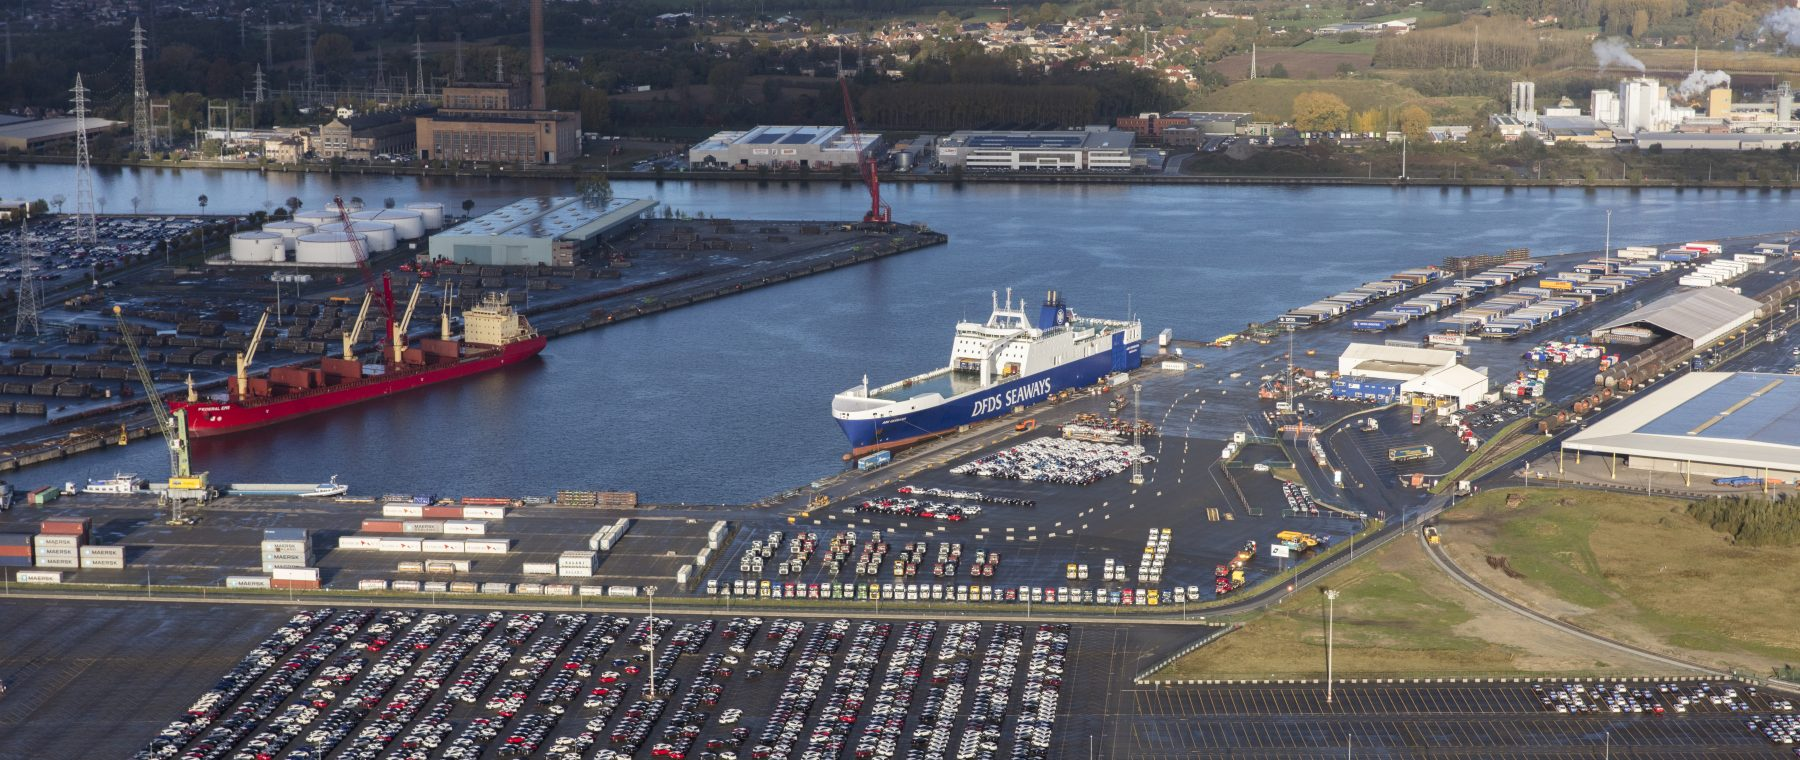 Case North Sea Port: Improving Collaboration in Port Asset Management with a Smart Online Platform GISGRO